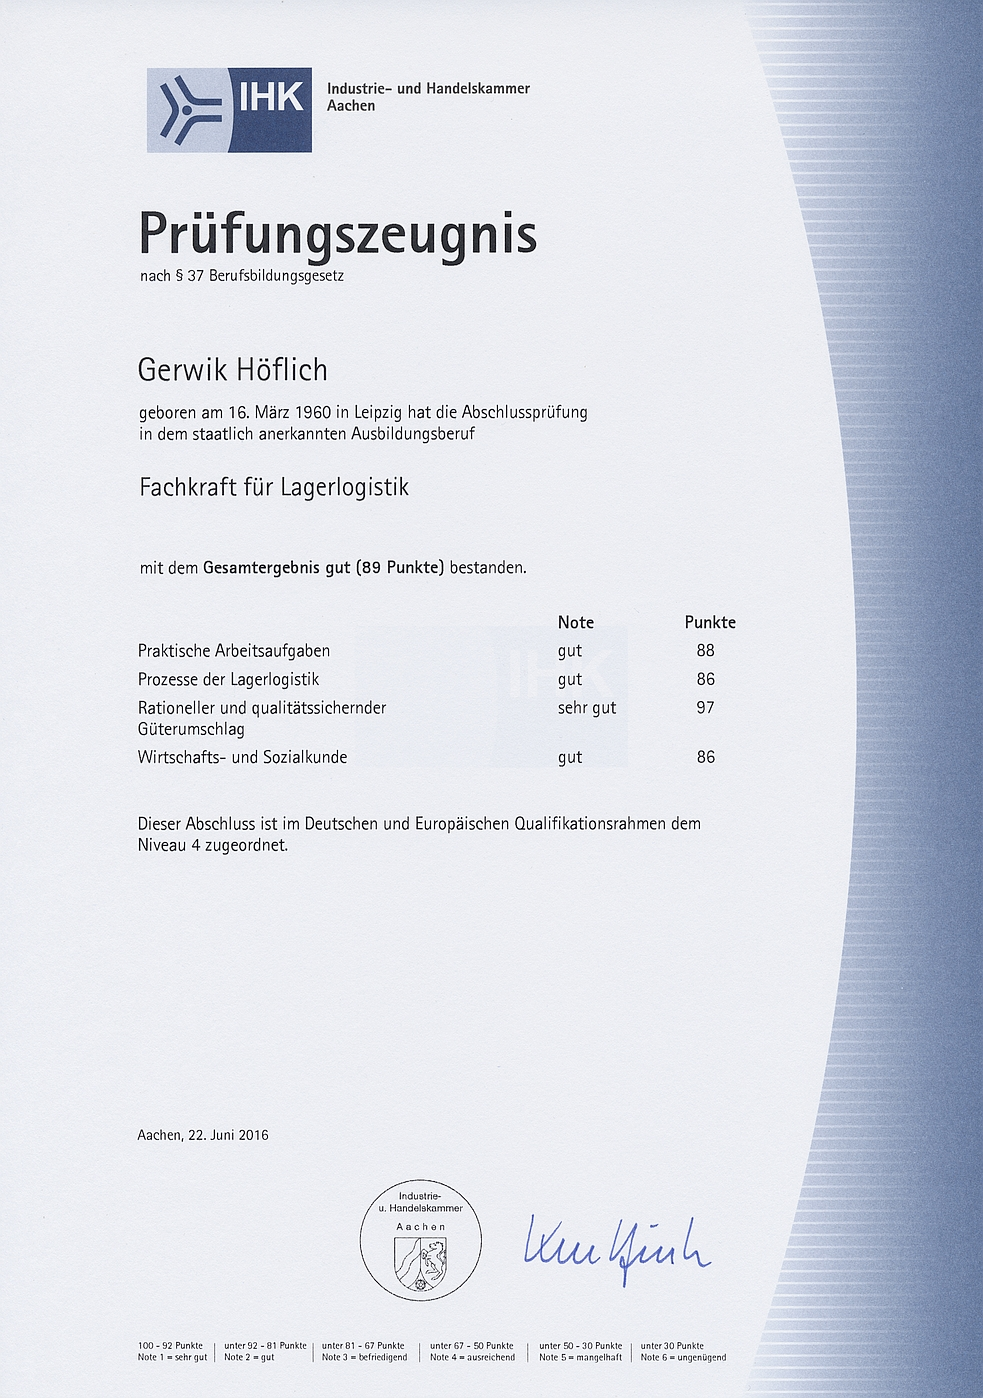 2016-06-22 ihk zertifikat 01